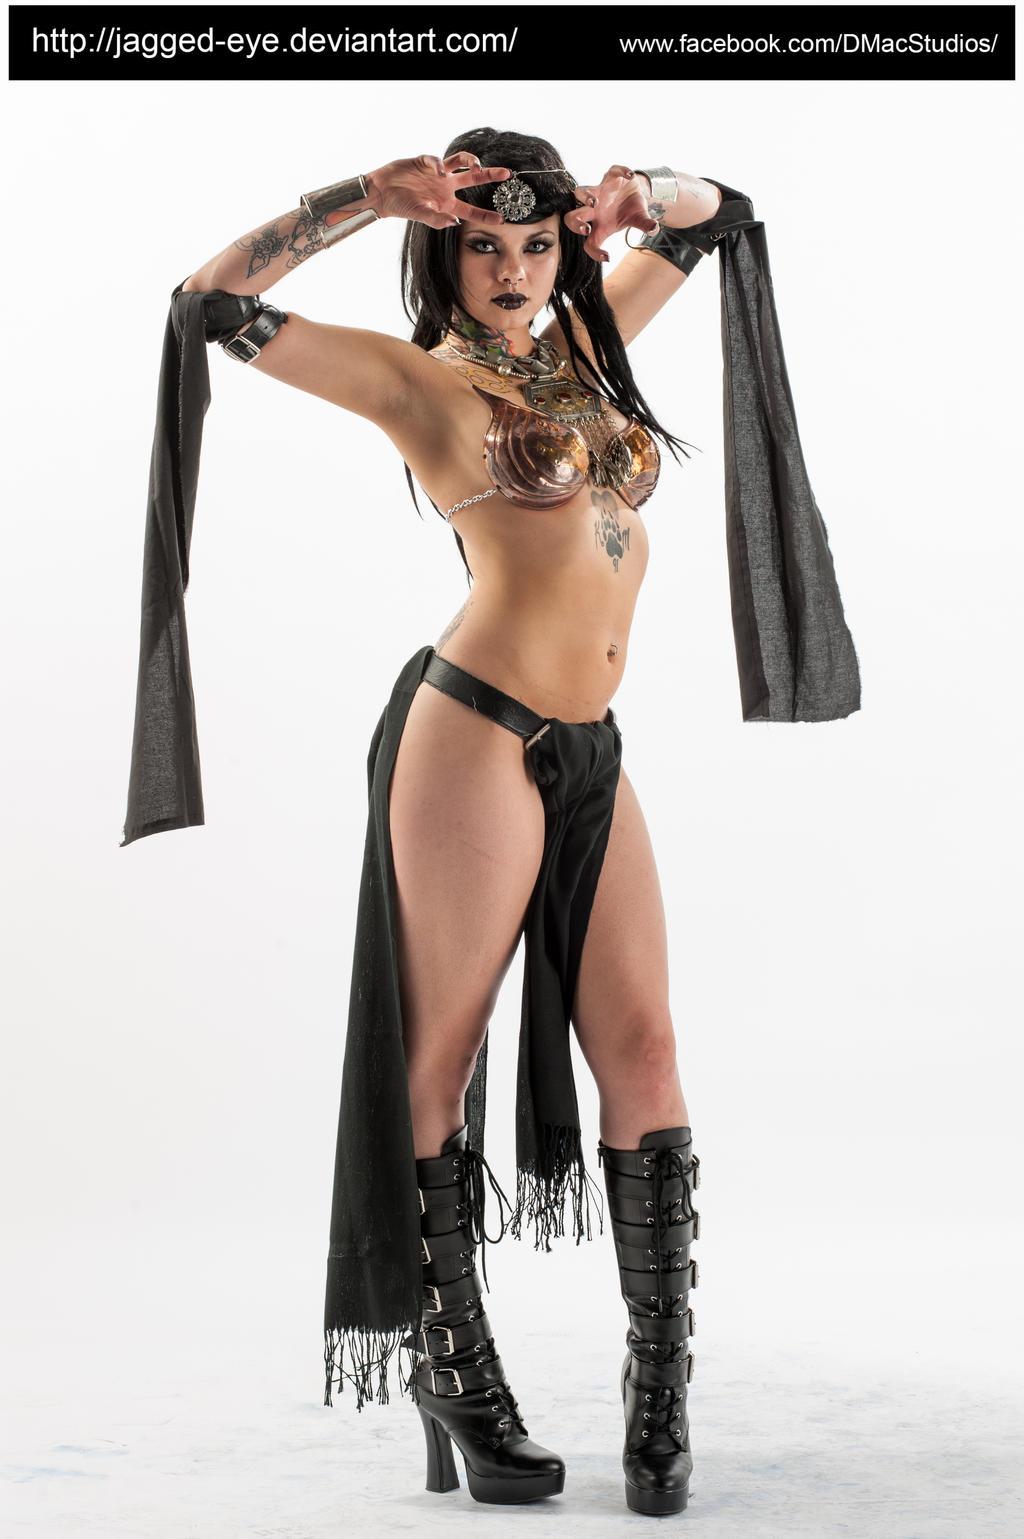 Talyn Sorceress-269